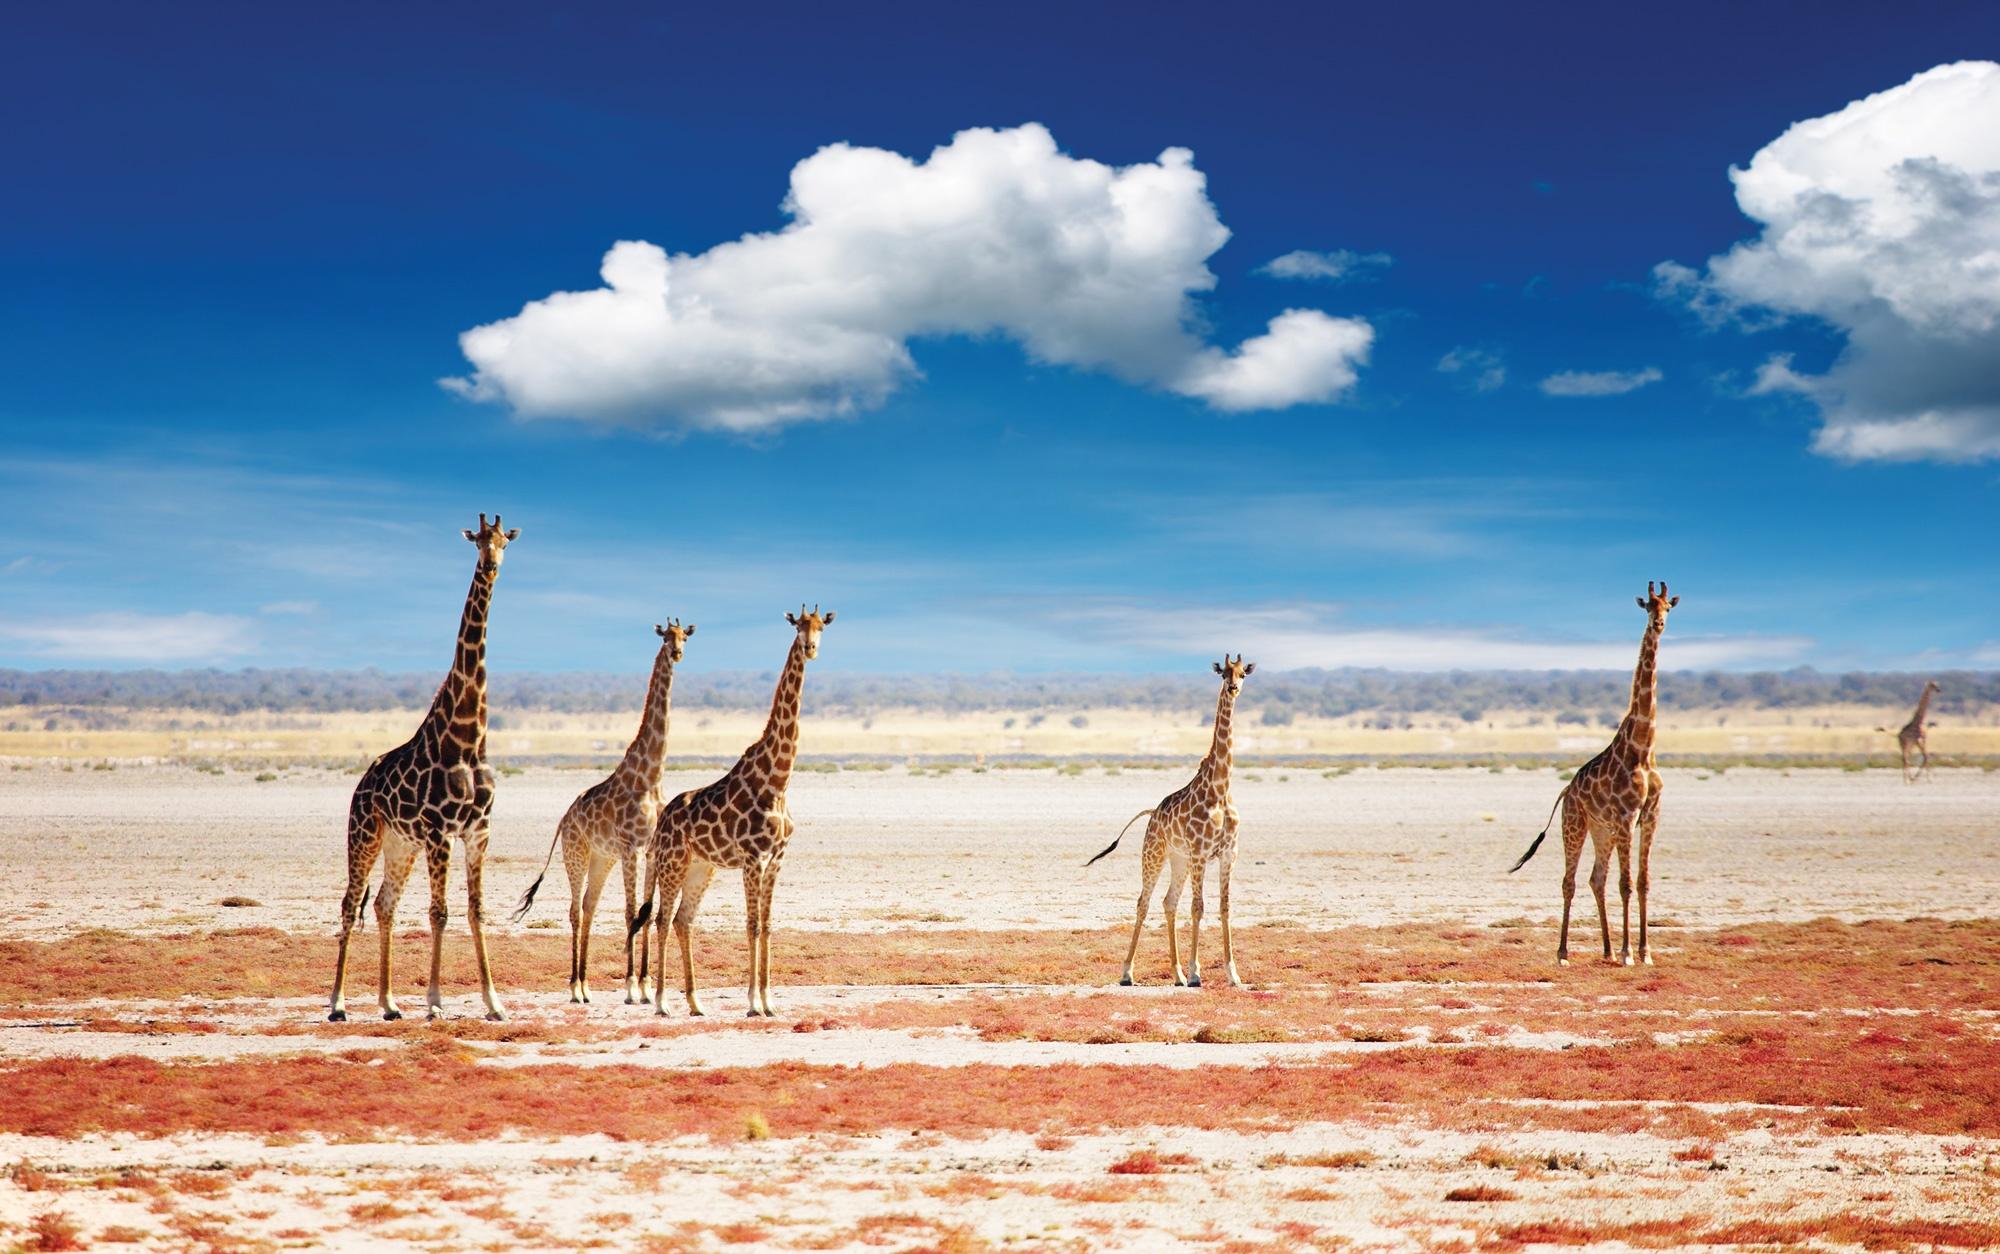 Travel Africa, Africa Safari Guide, Luxury African Safari